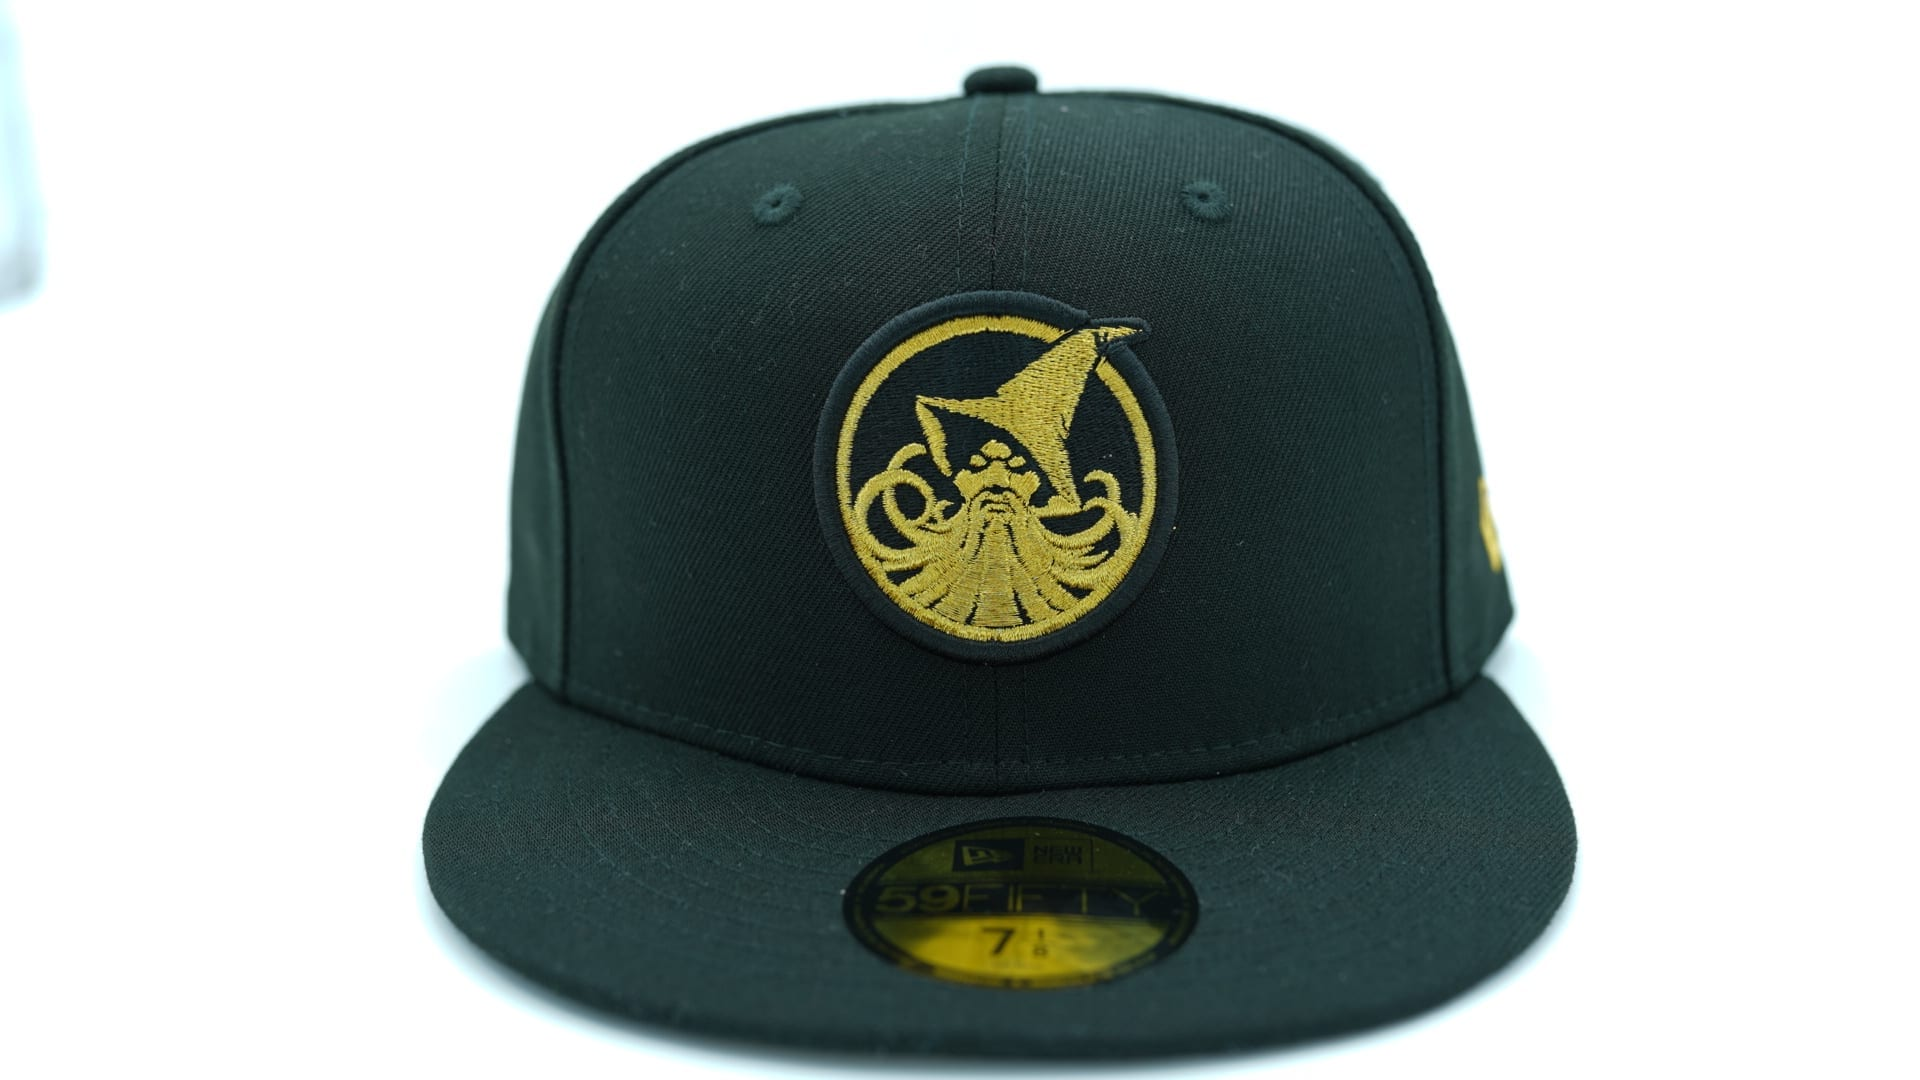 texas longhorns baseball stadium capacity side filler fitted cap era longhorn caps uk team hat